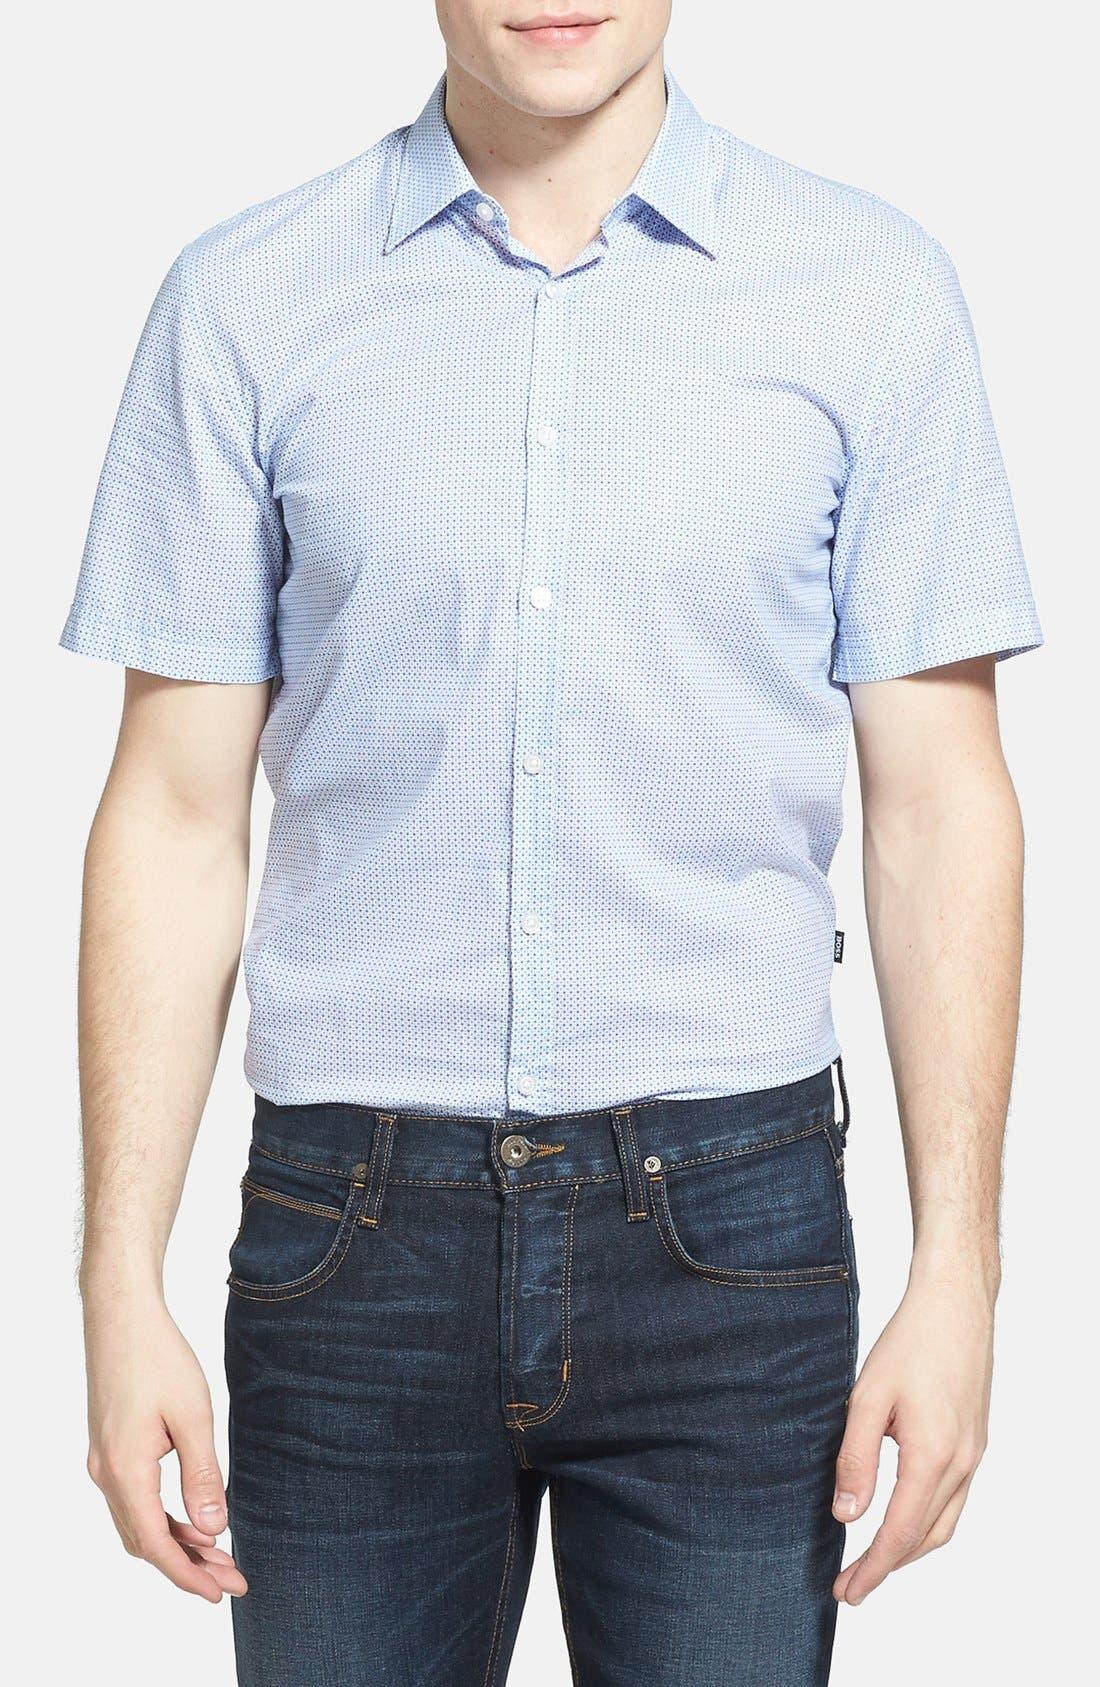 Main Image - BOSS HUGO BOSS 'Marco' Slim Fit Short Sleeve Print Sport Shirt